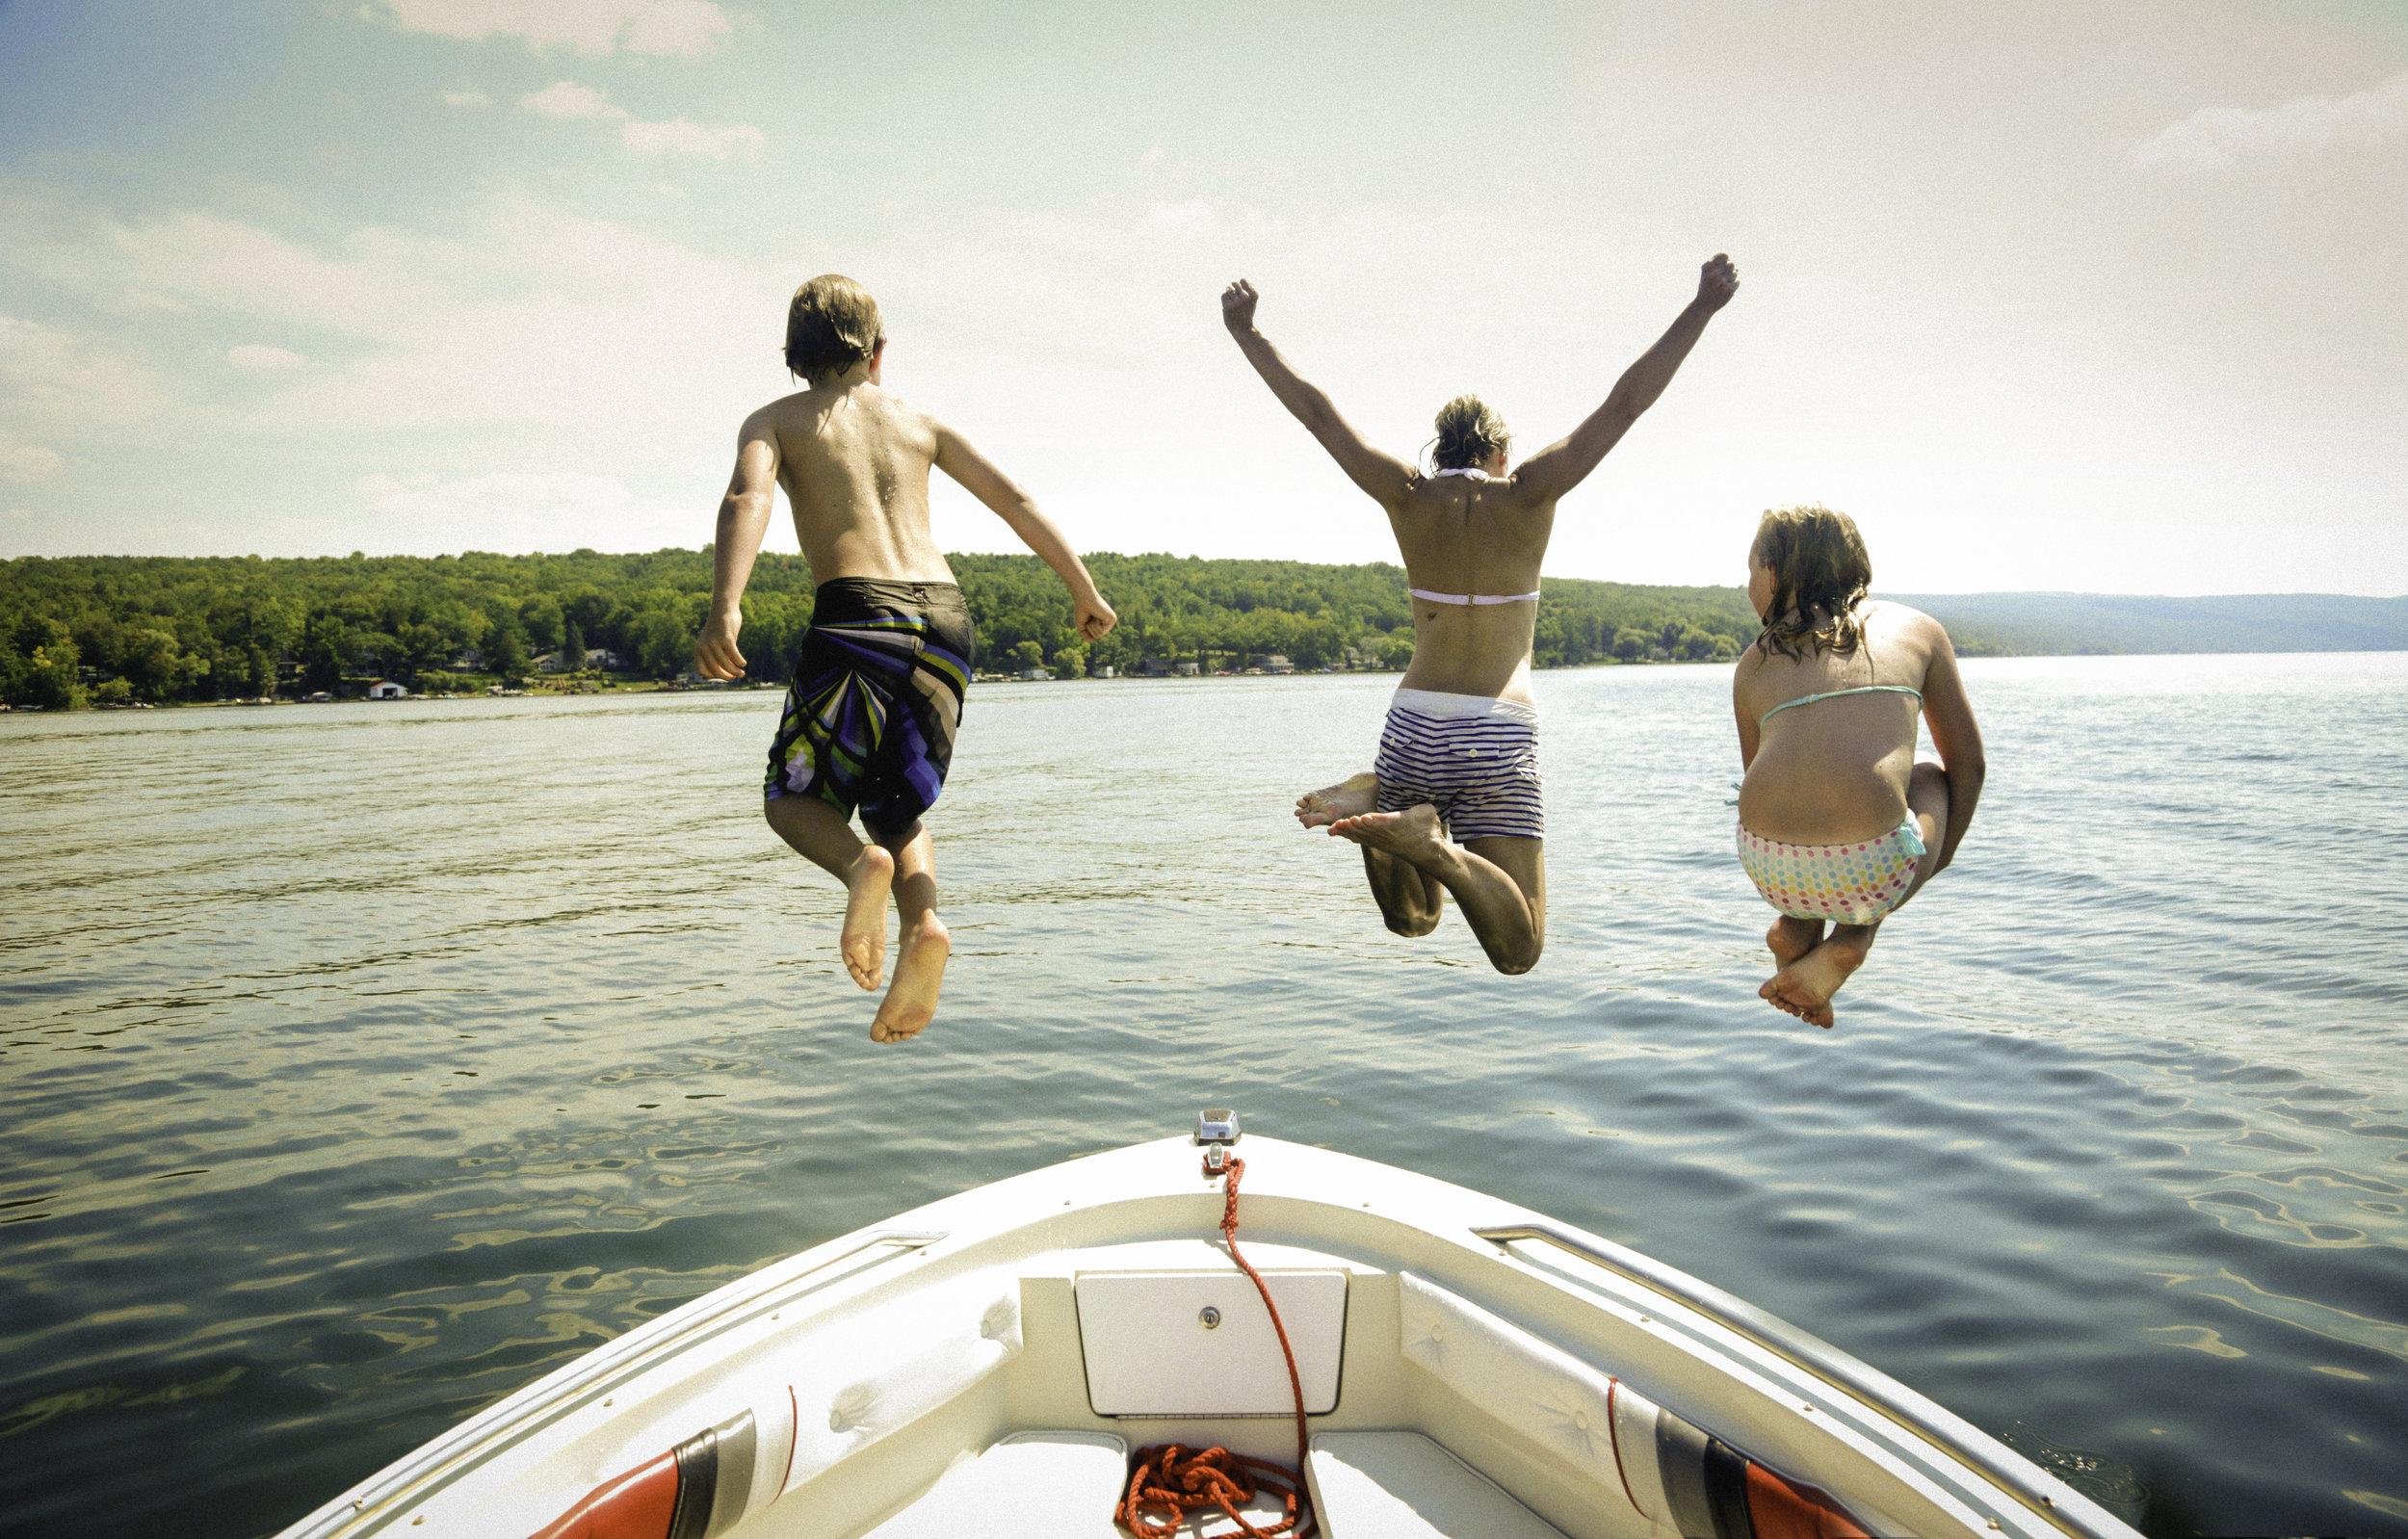 _W1A5547_boat jump_ritathompson.jpg